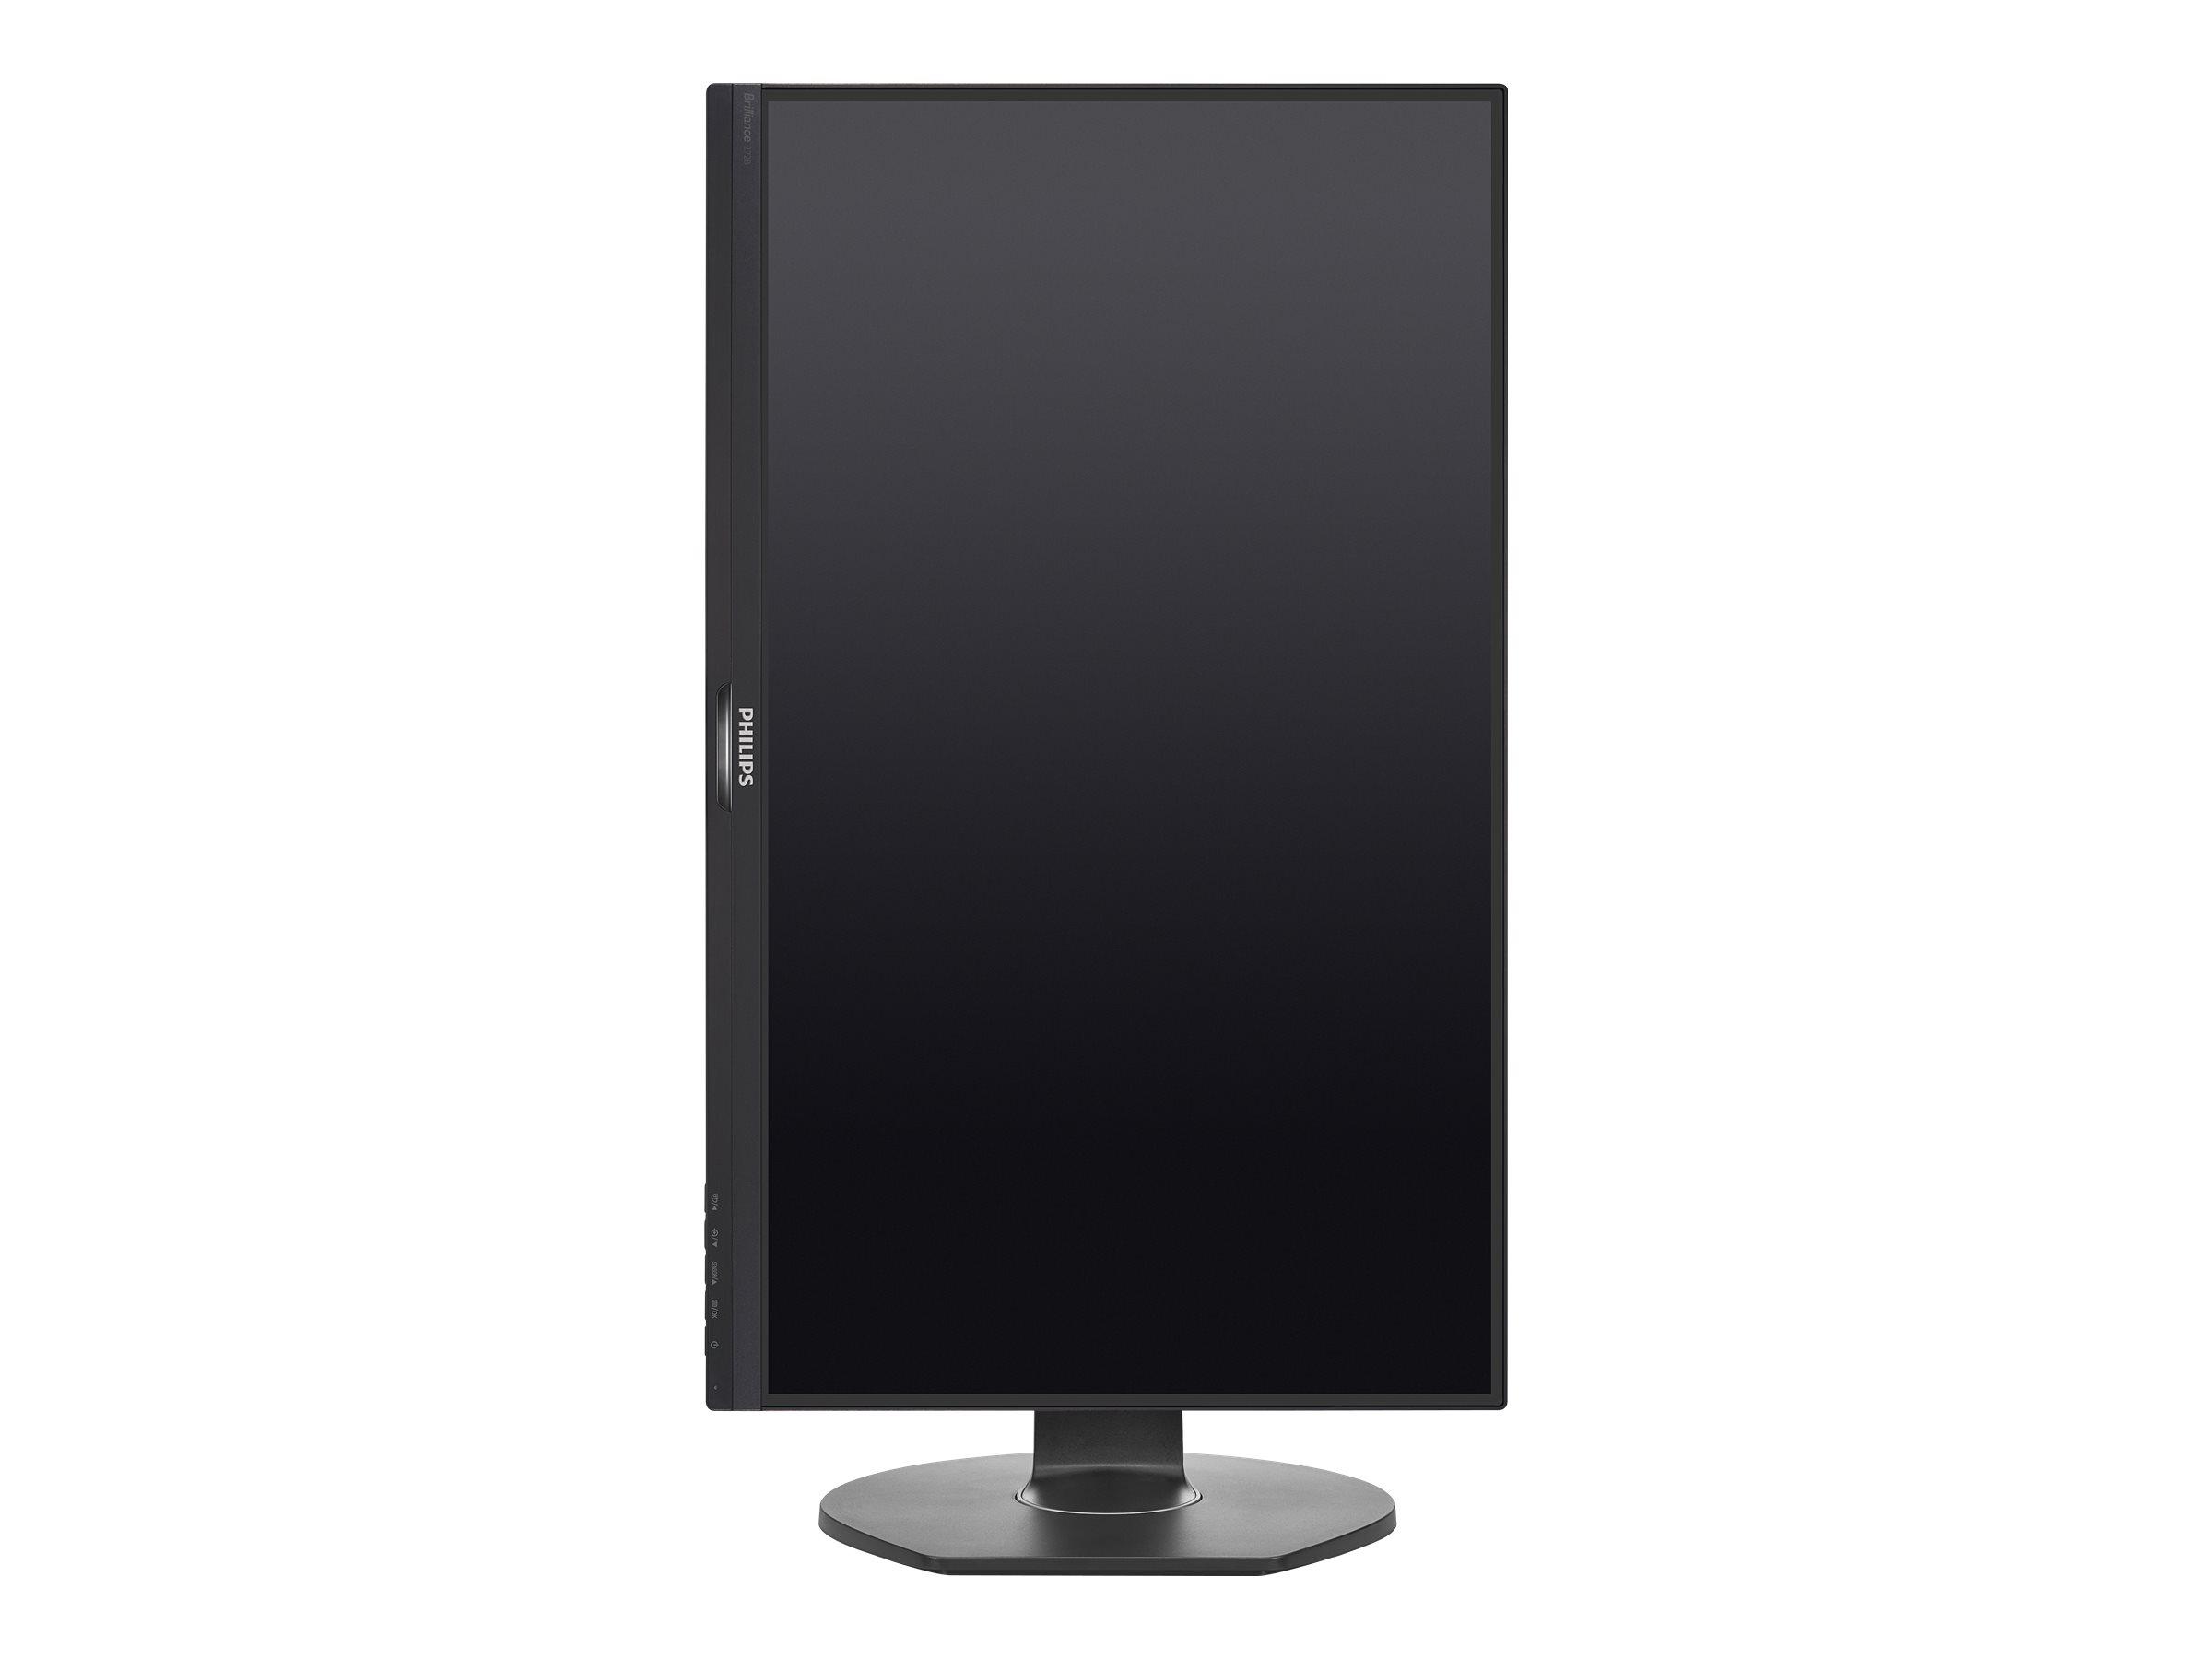 Philips Brilliance B-line 272B7QPJEB - LED-Monitor - 68.5 cm (27